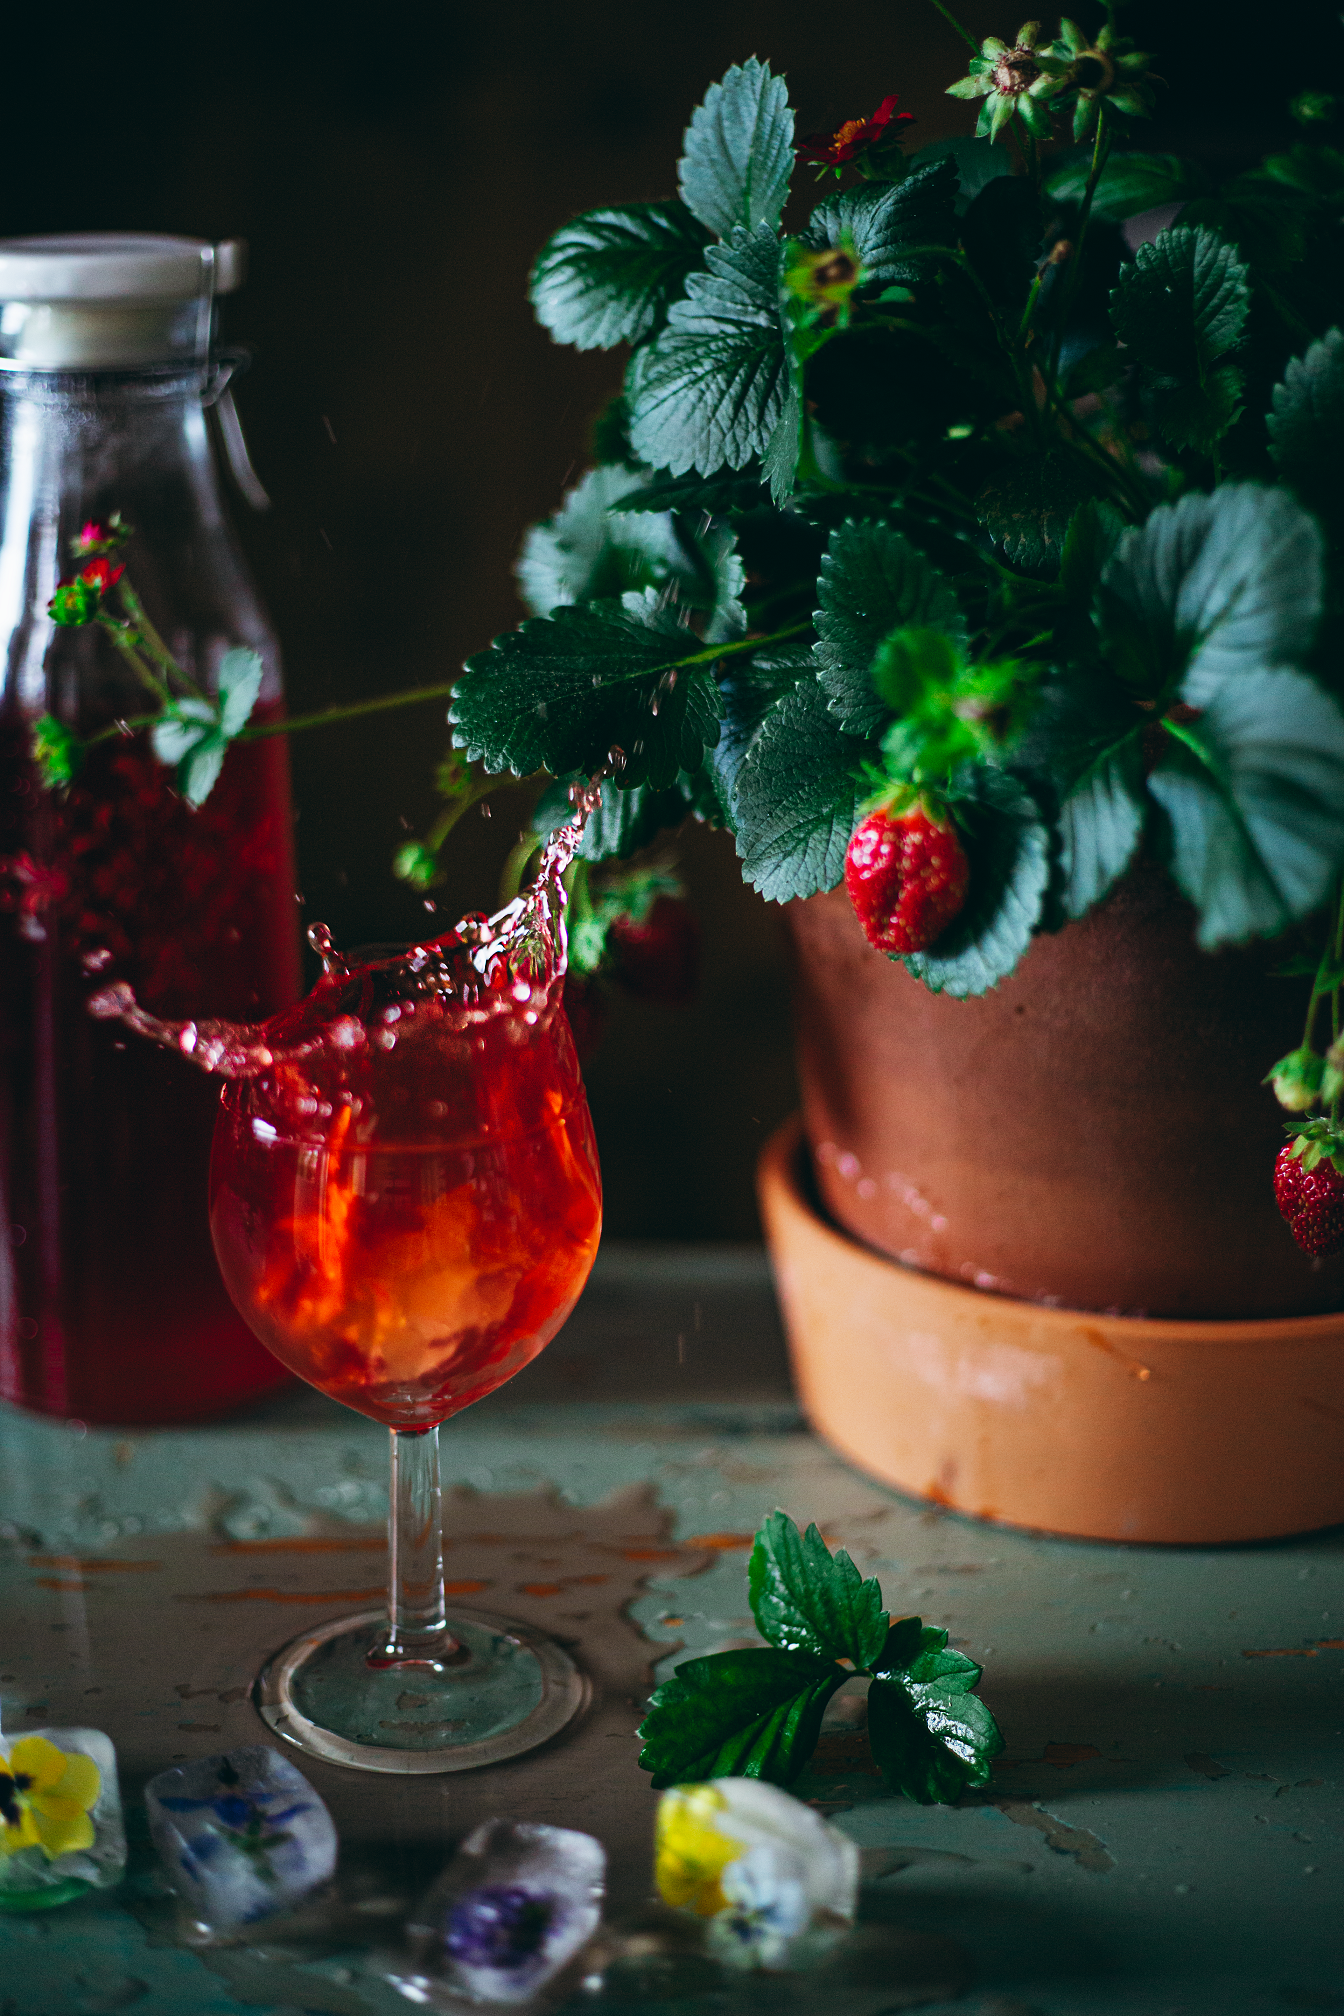 Splash Photography - Zero-Waste Strawberry Juice - Adagio Blog by Thais FK